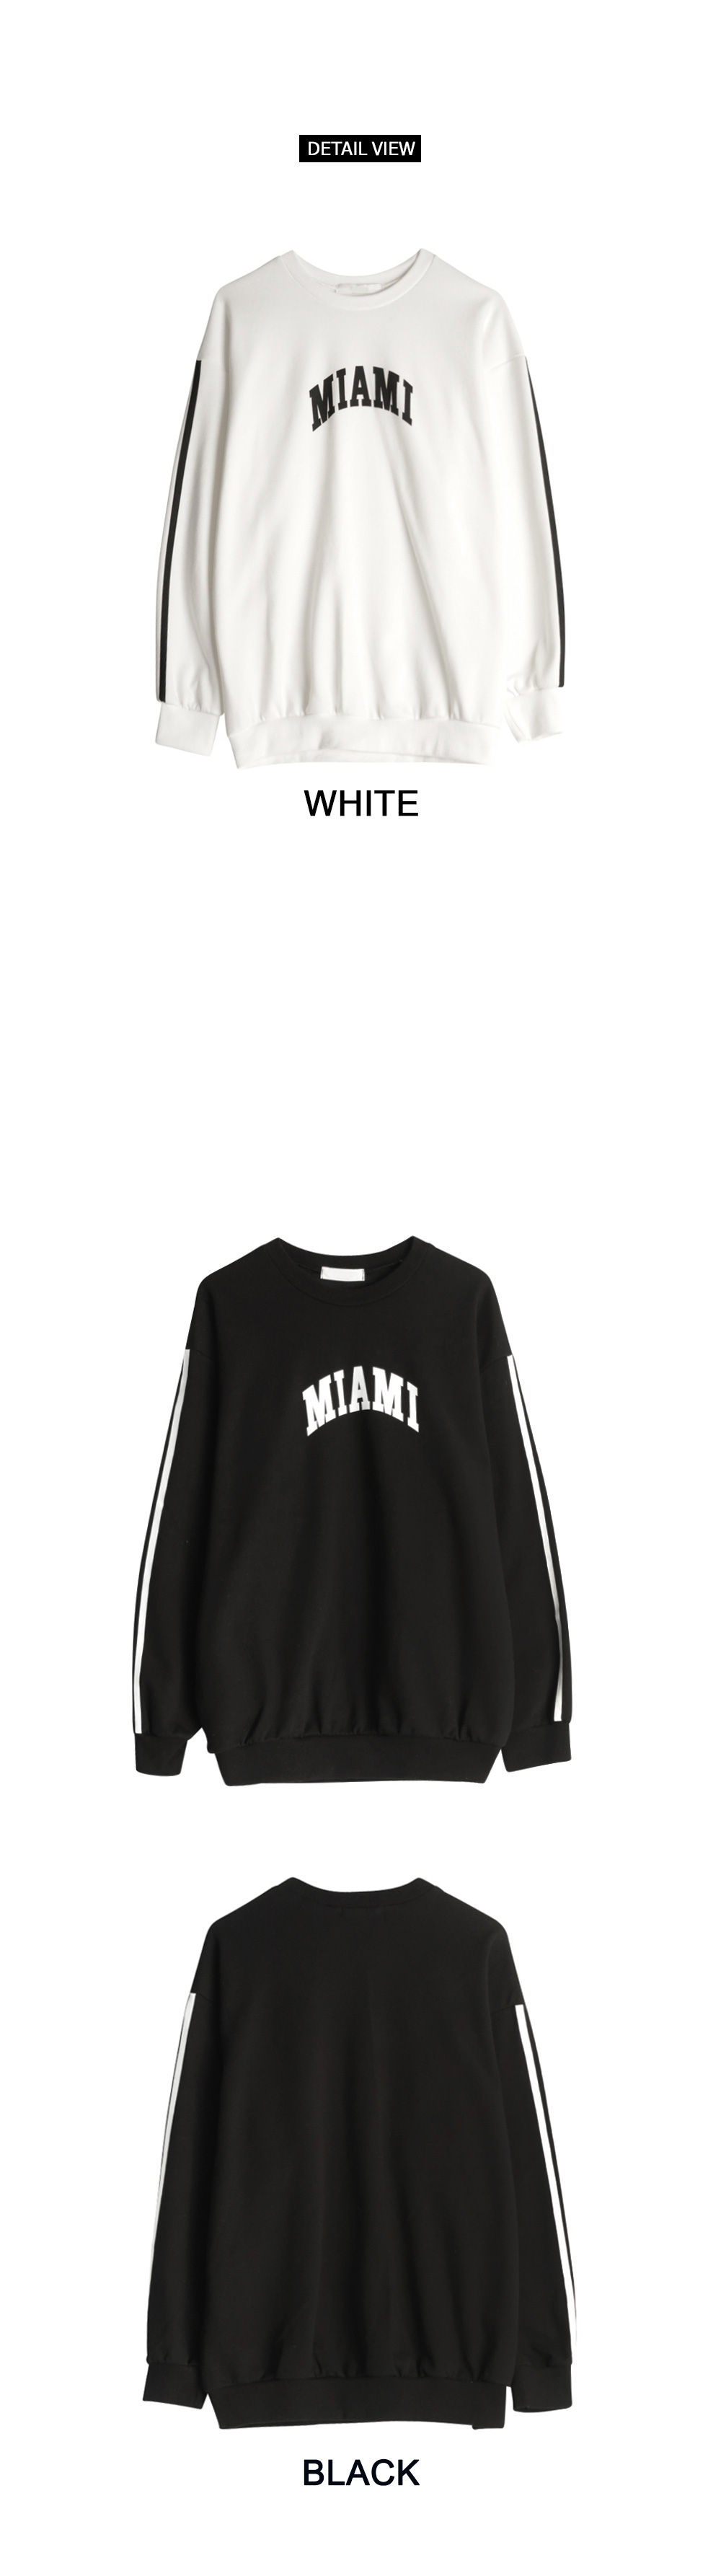 Miami line one-man